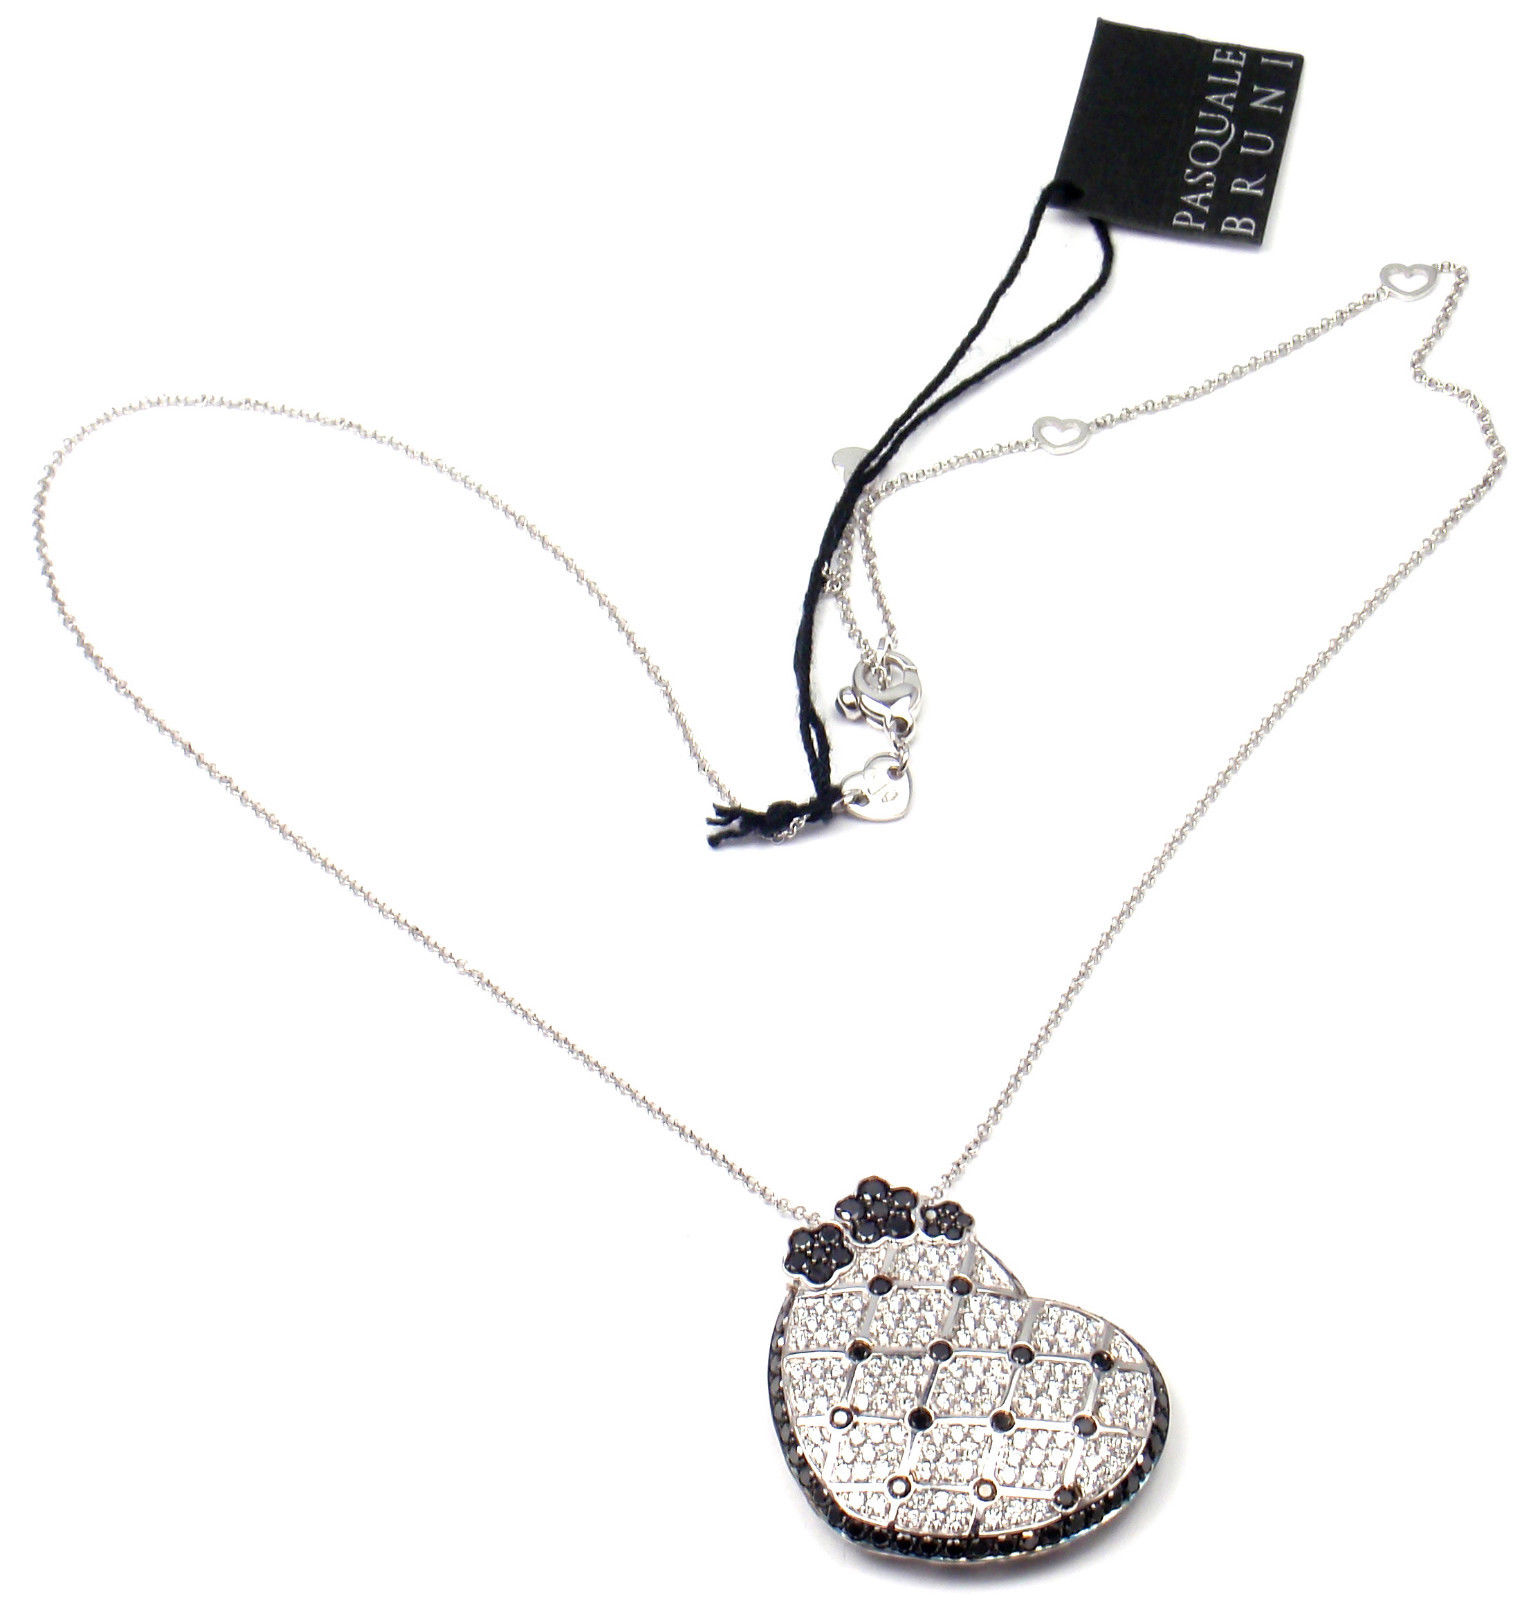 """""Pasquale Bruni 18K White Gold Lulu Diamond Pendant Necklace"""""" 433244"